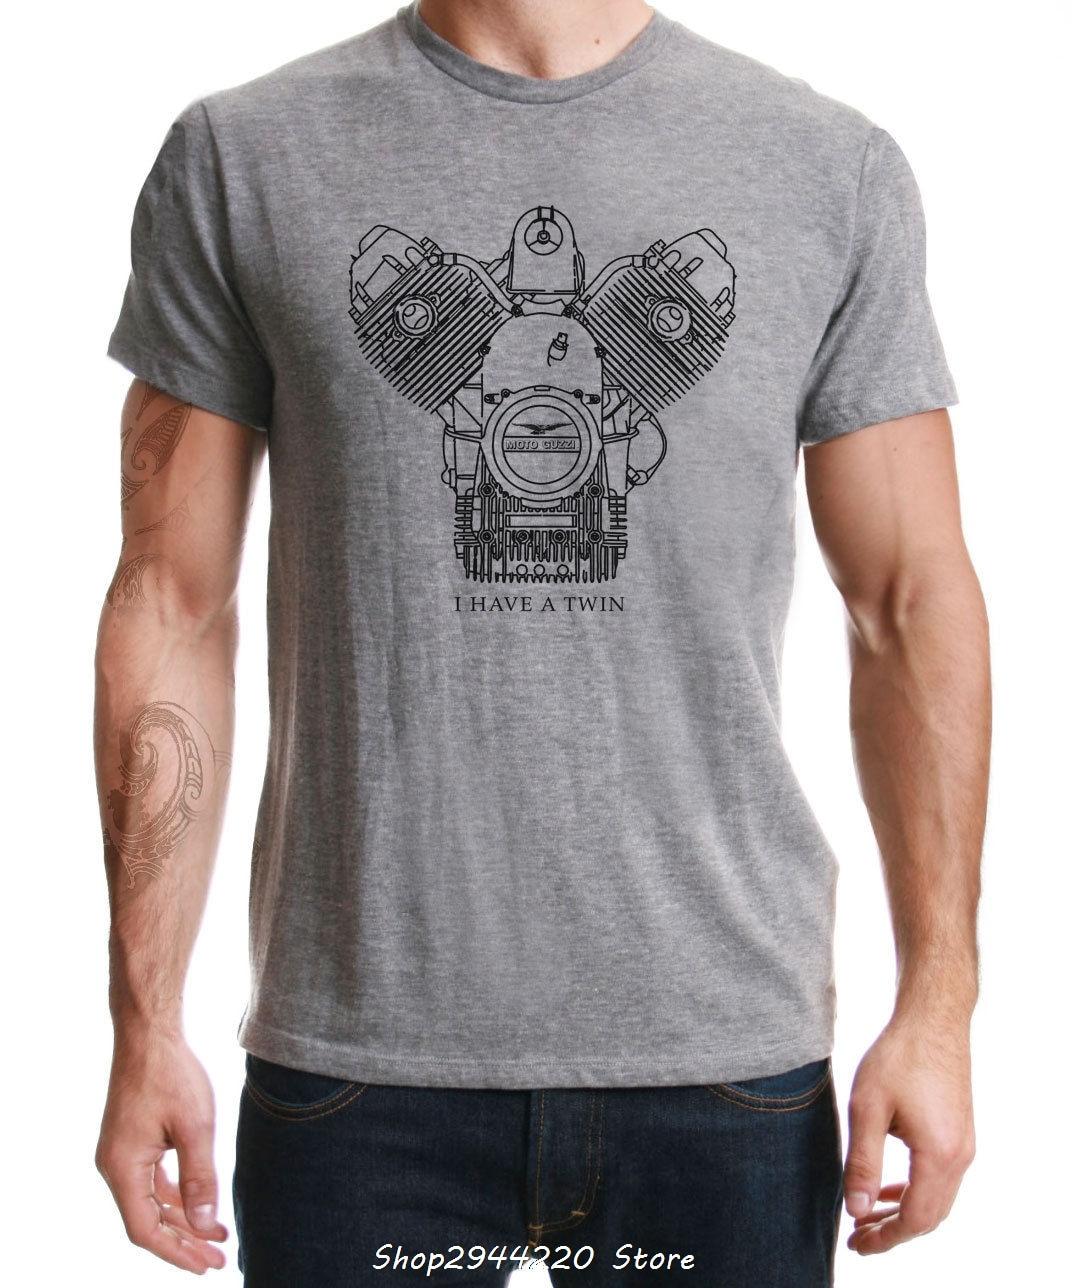 Shirt design online uk - Ray Oak Band 2017 New Man Design T Shirt Print Moto Classic Motorcycle T Shirts